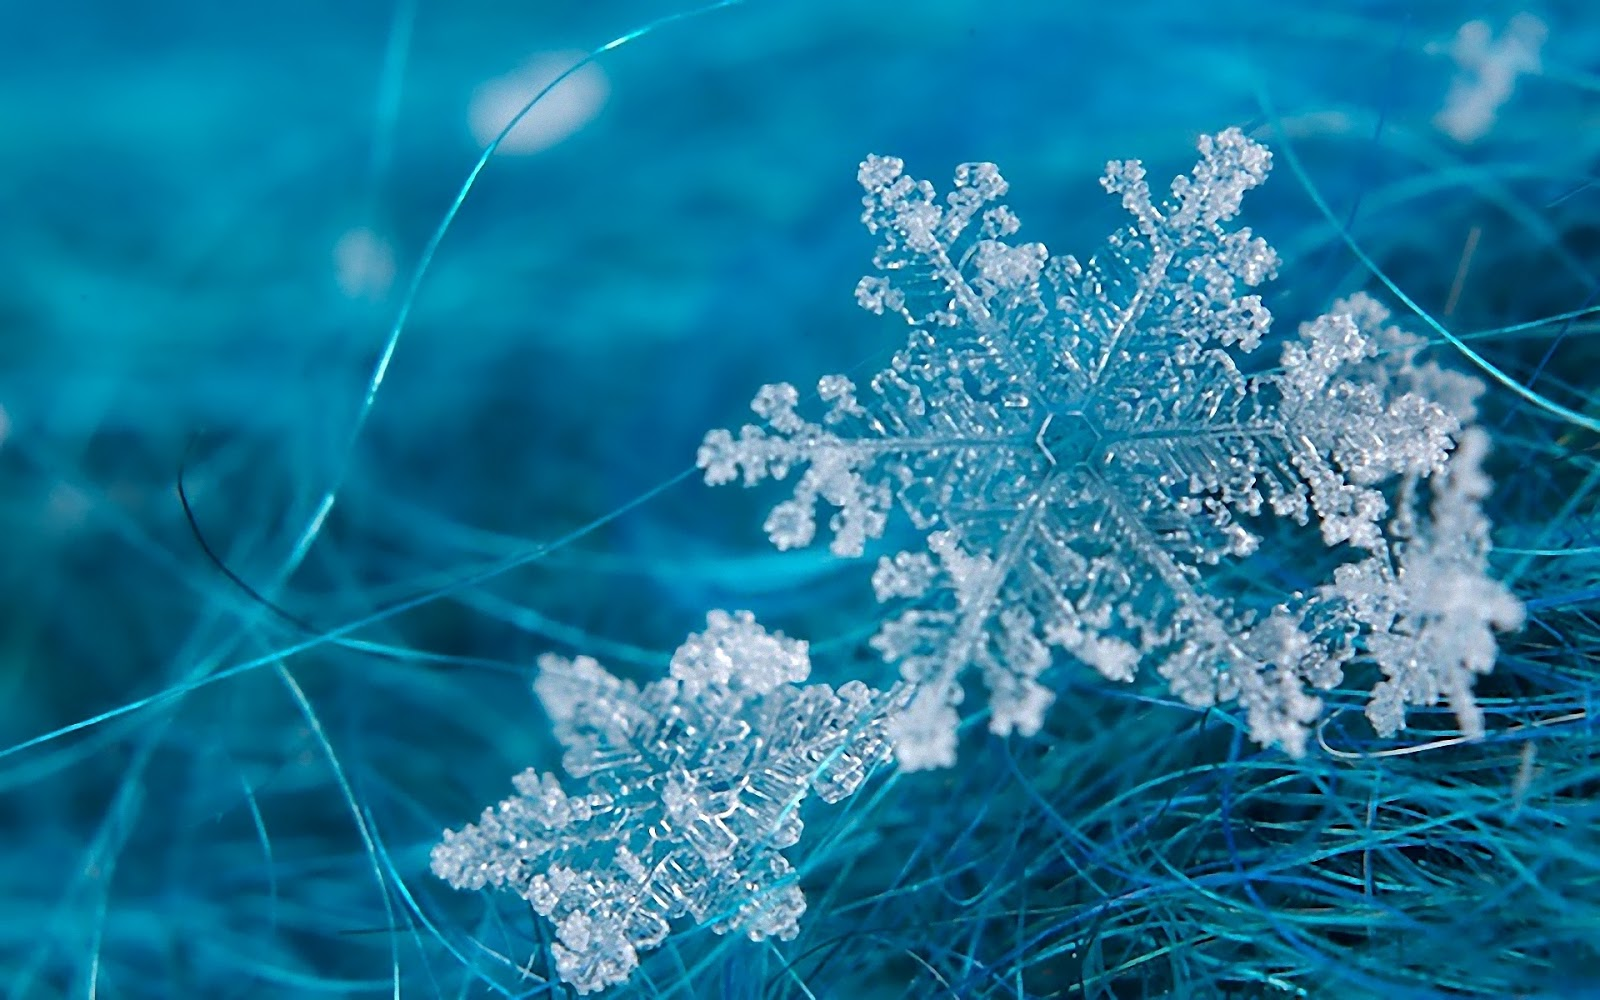 los copos de nieve-hexagonos ceramicos-ceramica a mano alzada